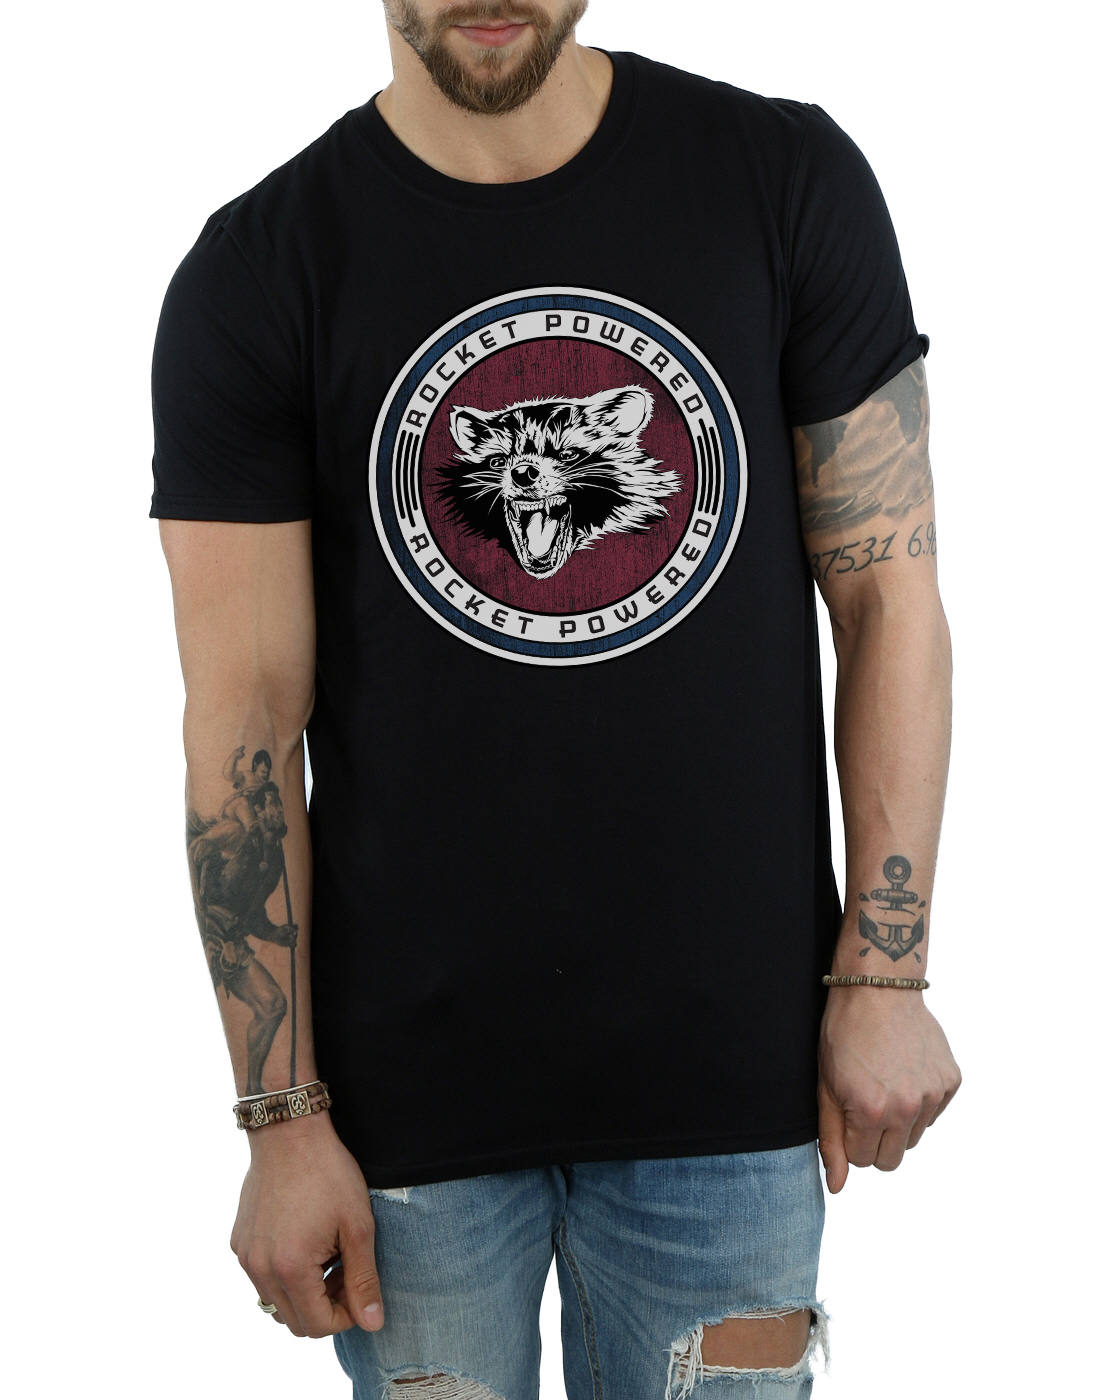 Marvel Mens Guardians of the Galaxy Rocket Powered T-Shirt Fashion T Shirts Brand